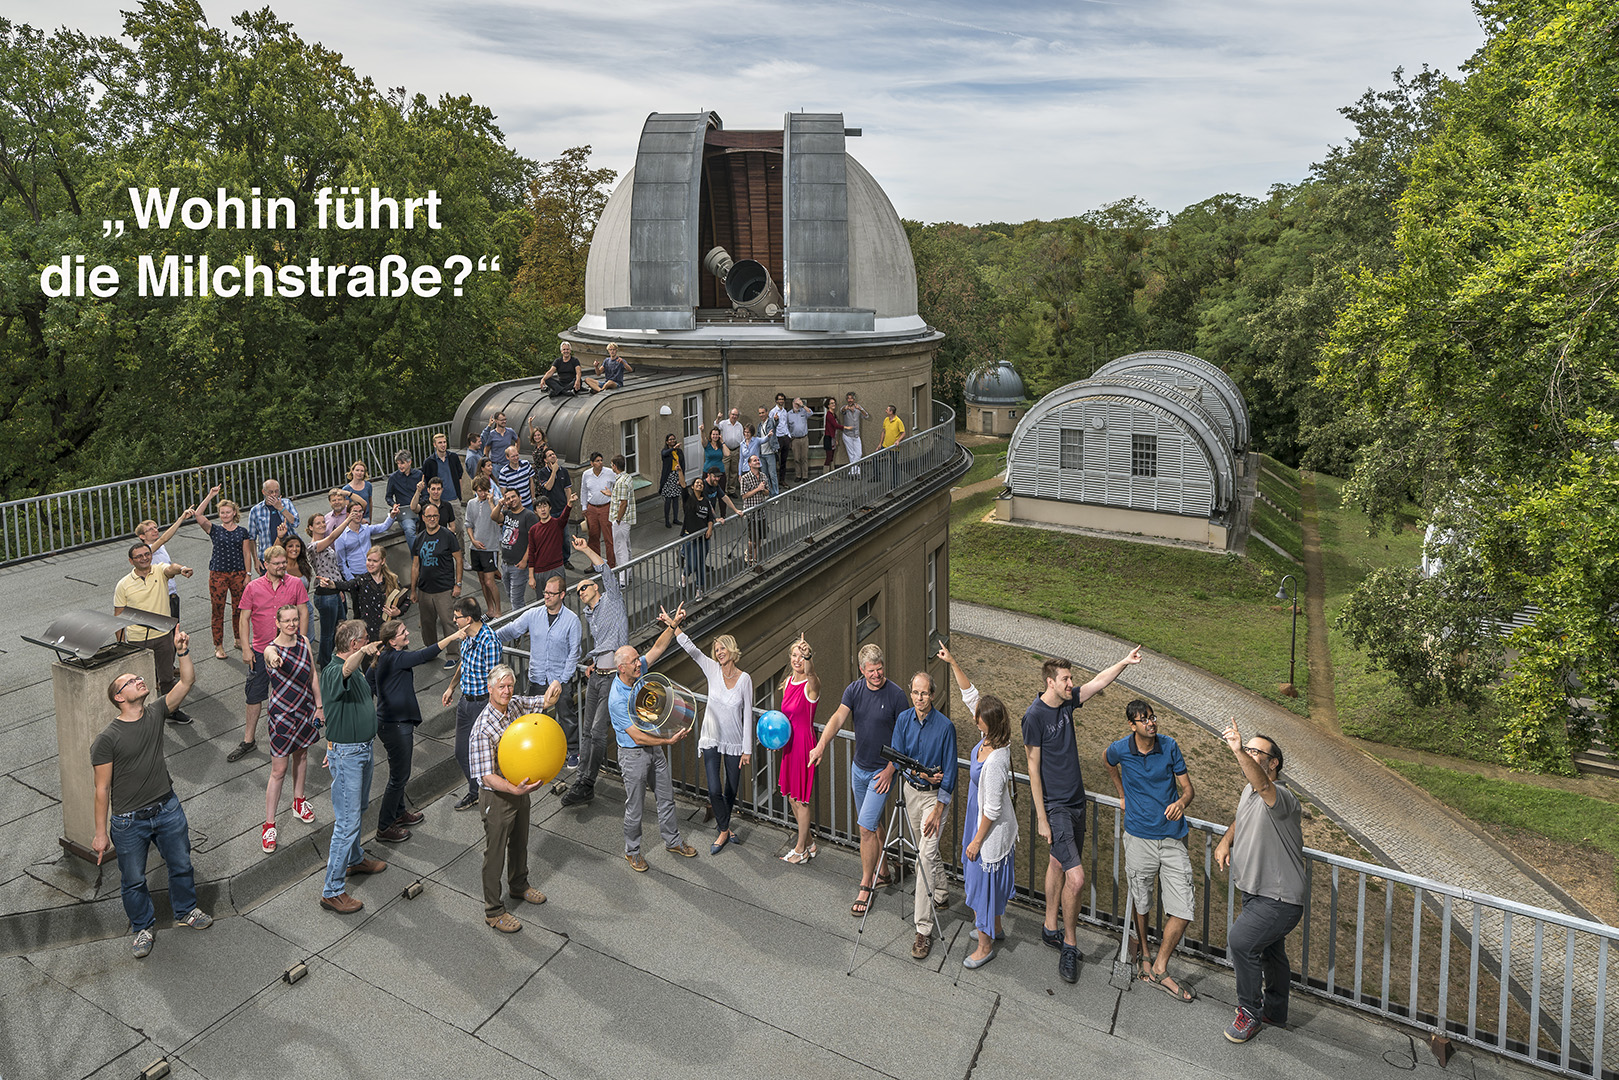 Leibniz-Institut für Astrophysik Potsdam (AIP)